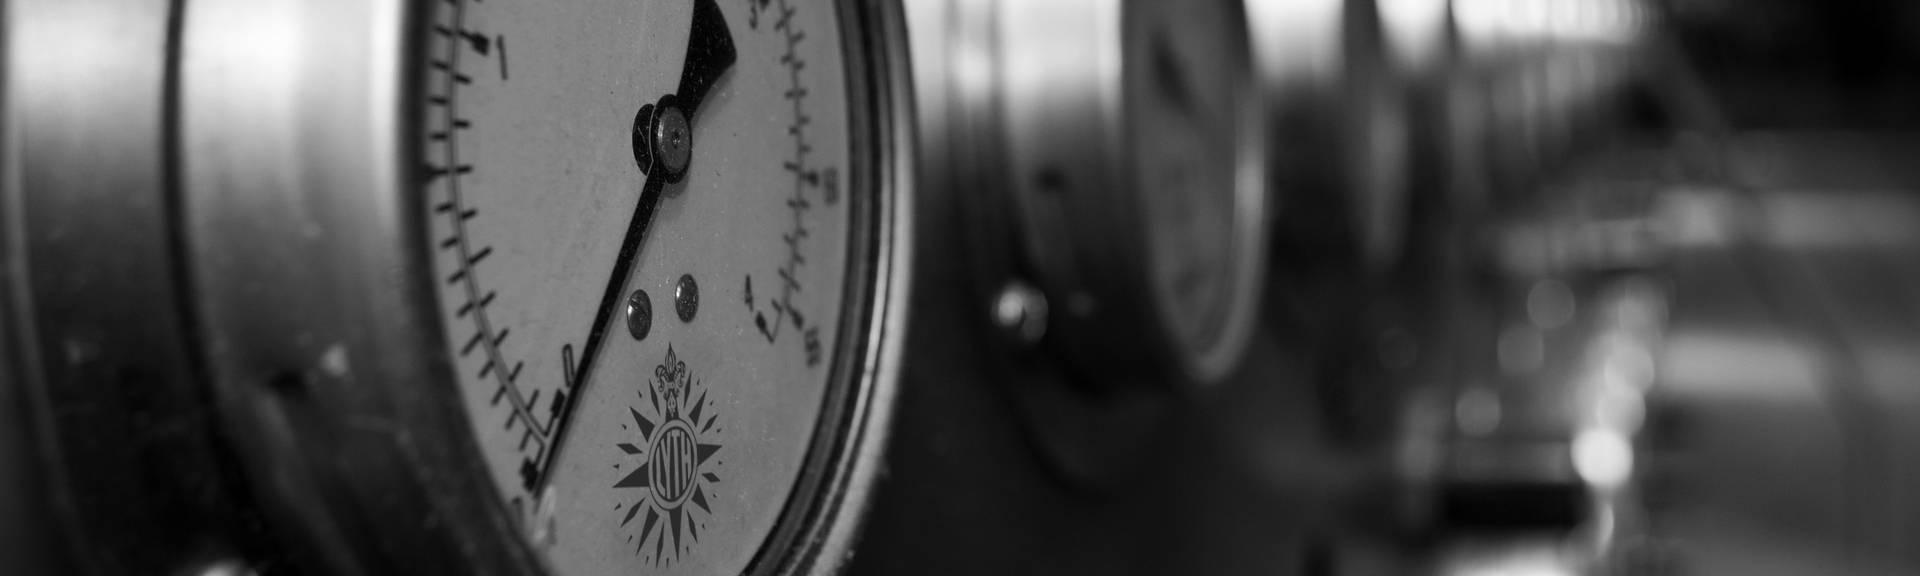 Lyth pressure gauges row